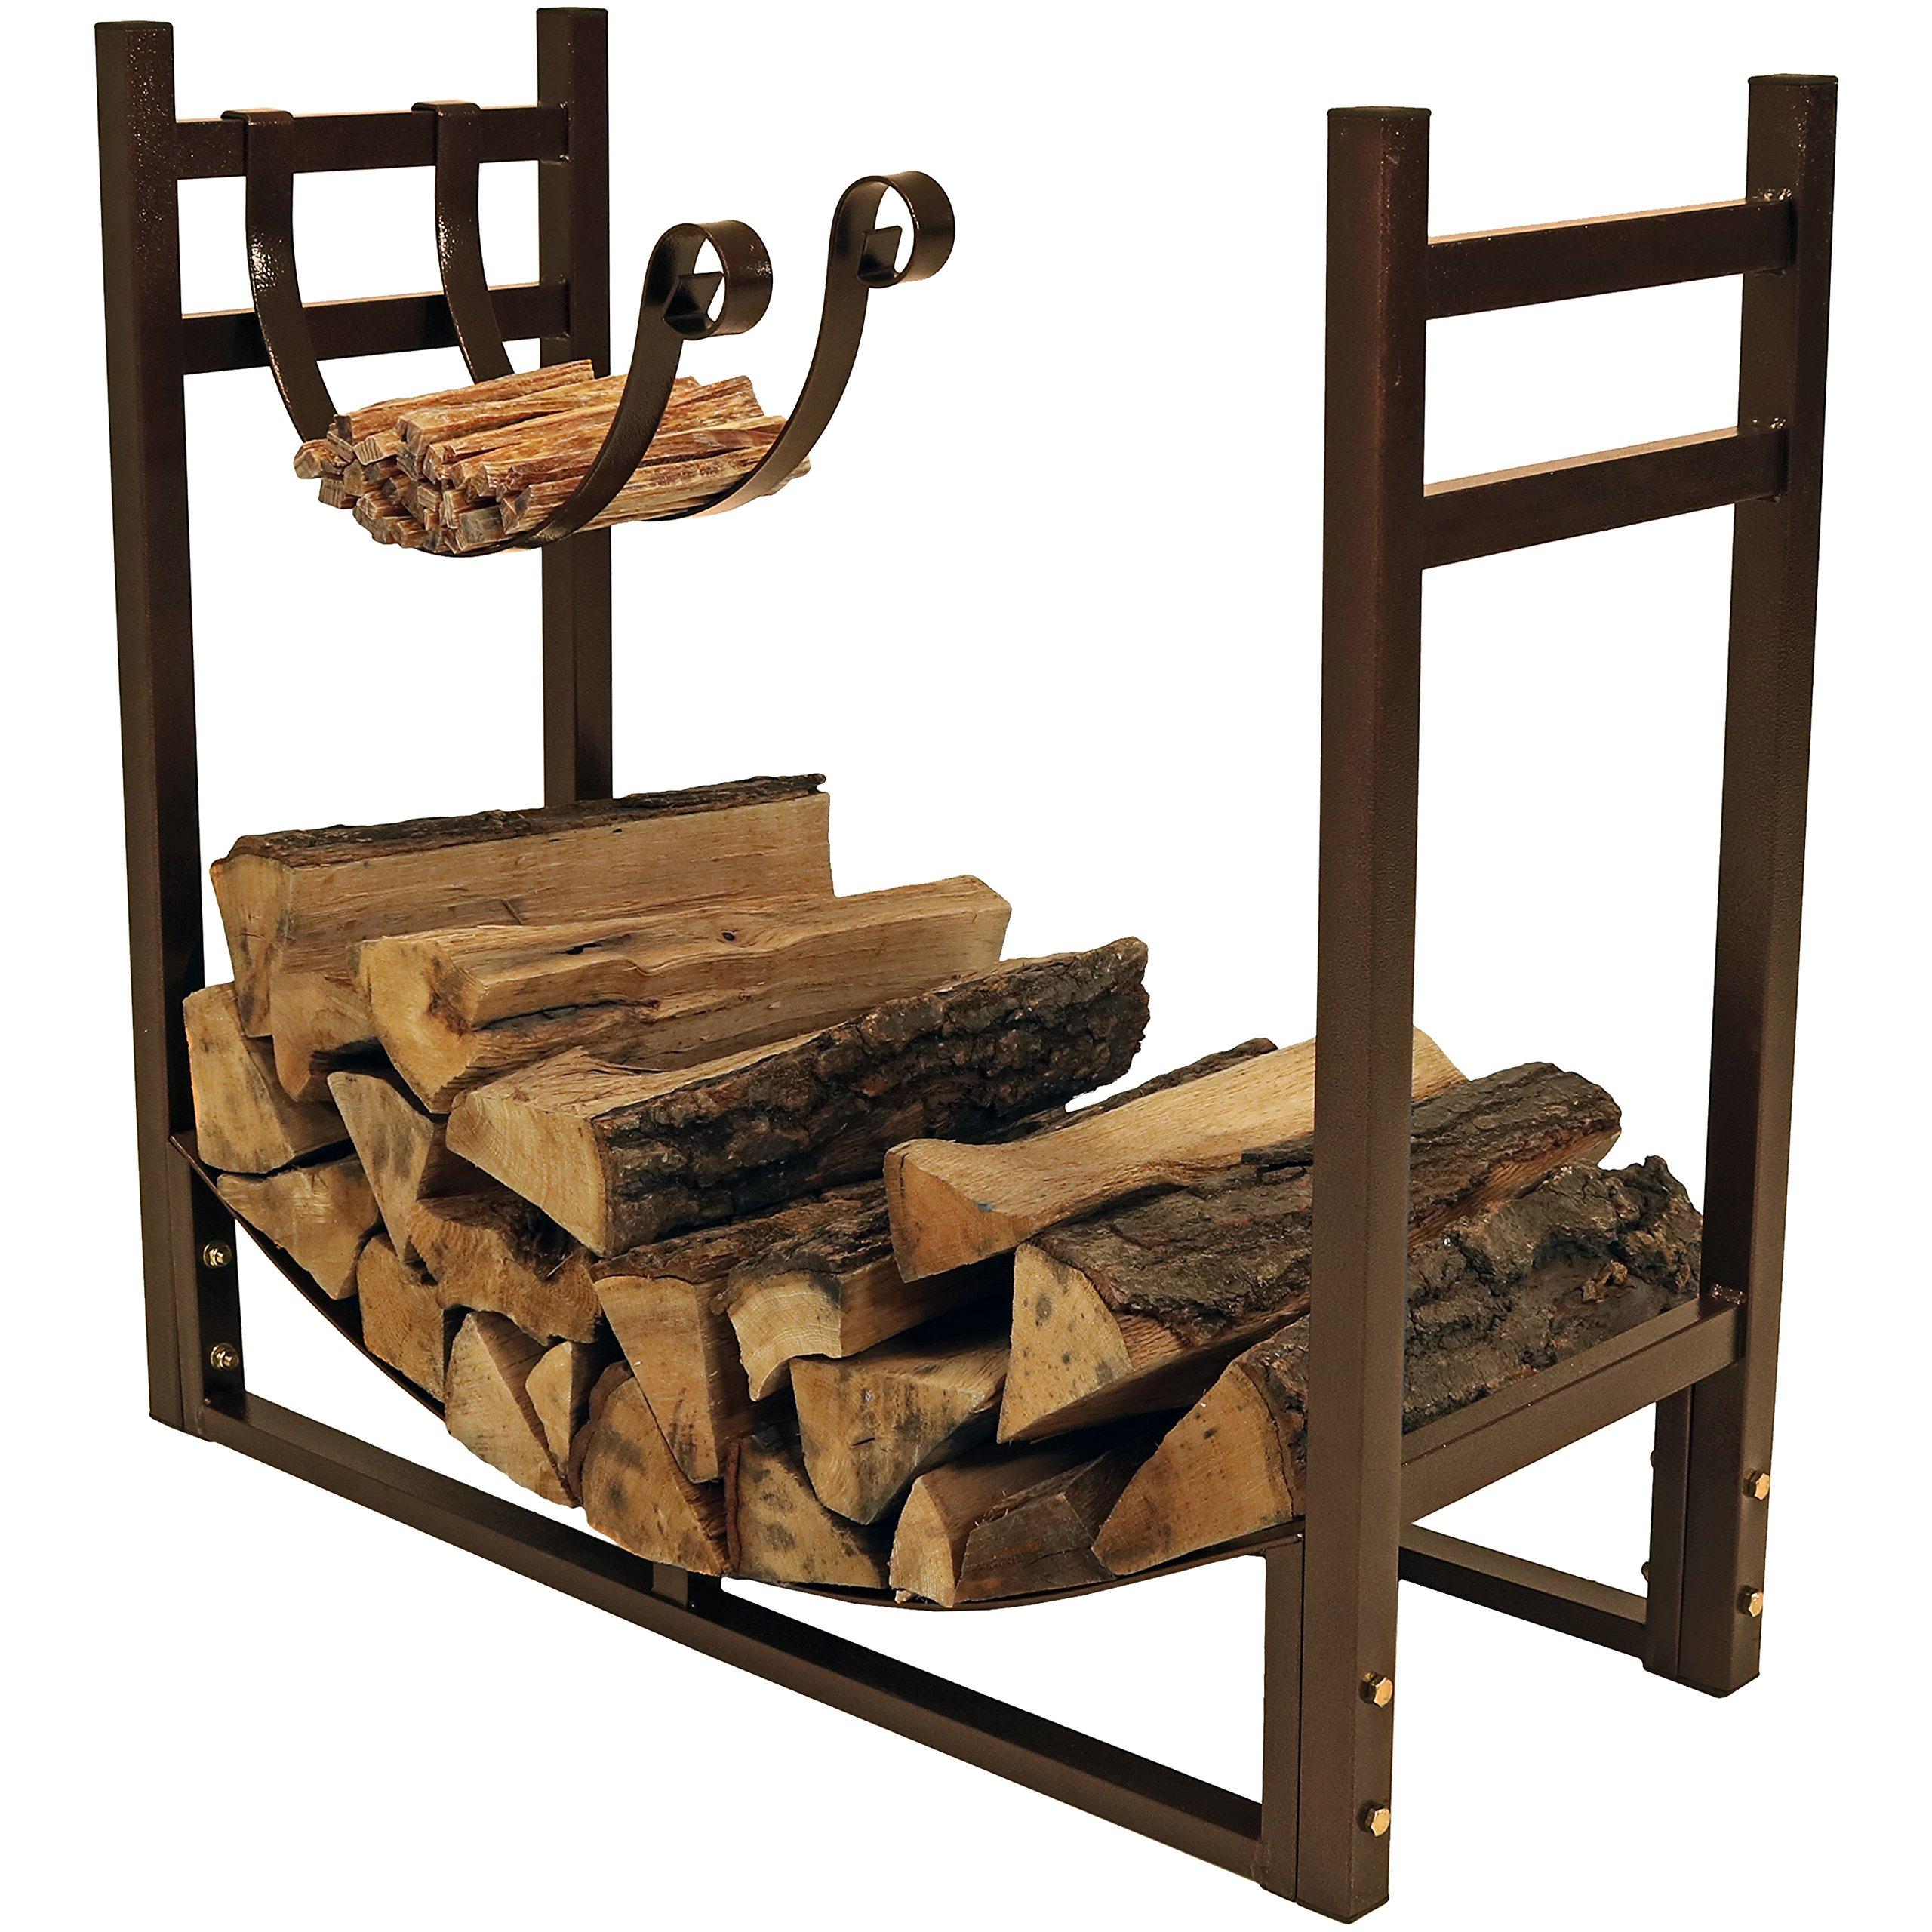 Sunnydaze Firewood Rack with Kindling Holder - Indoor or Outdoor Fireplace Log Rack Firewood Holder for Wood Storage - 33 Inch Wide x 30 Inch Tall, Bronze by Sunnydaze Decor